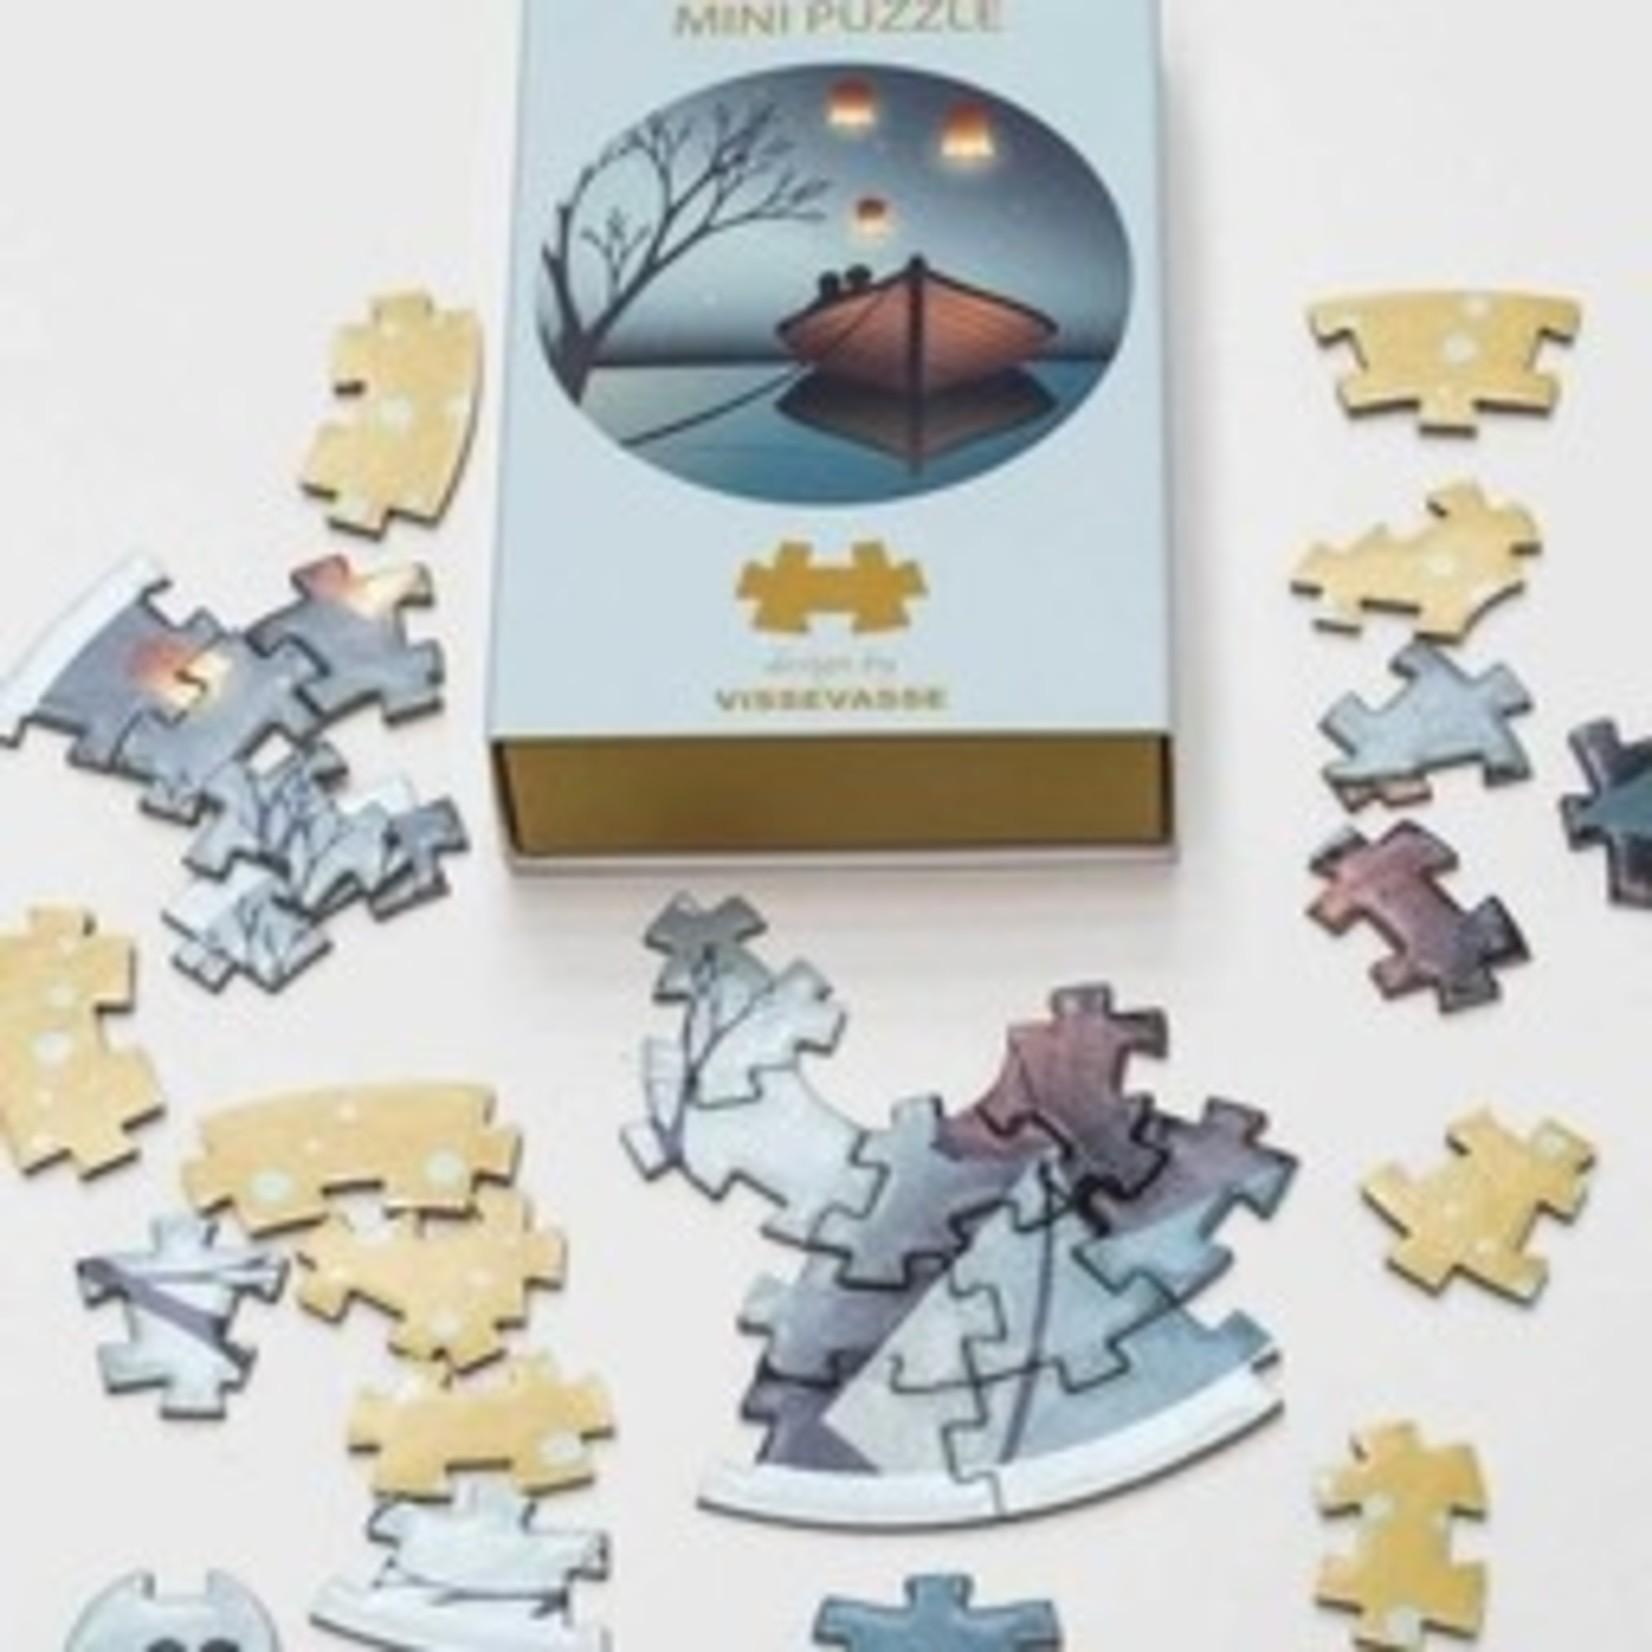 Mini puzzel - 3 varianten - Vissevasse